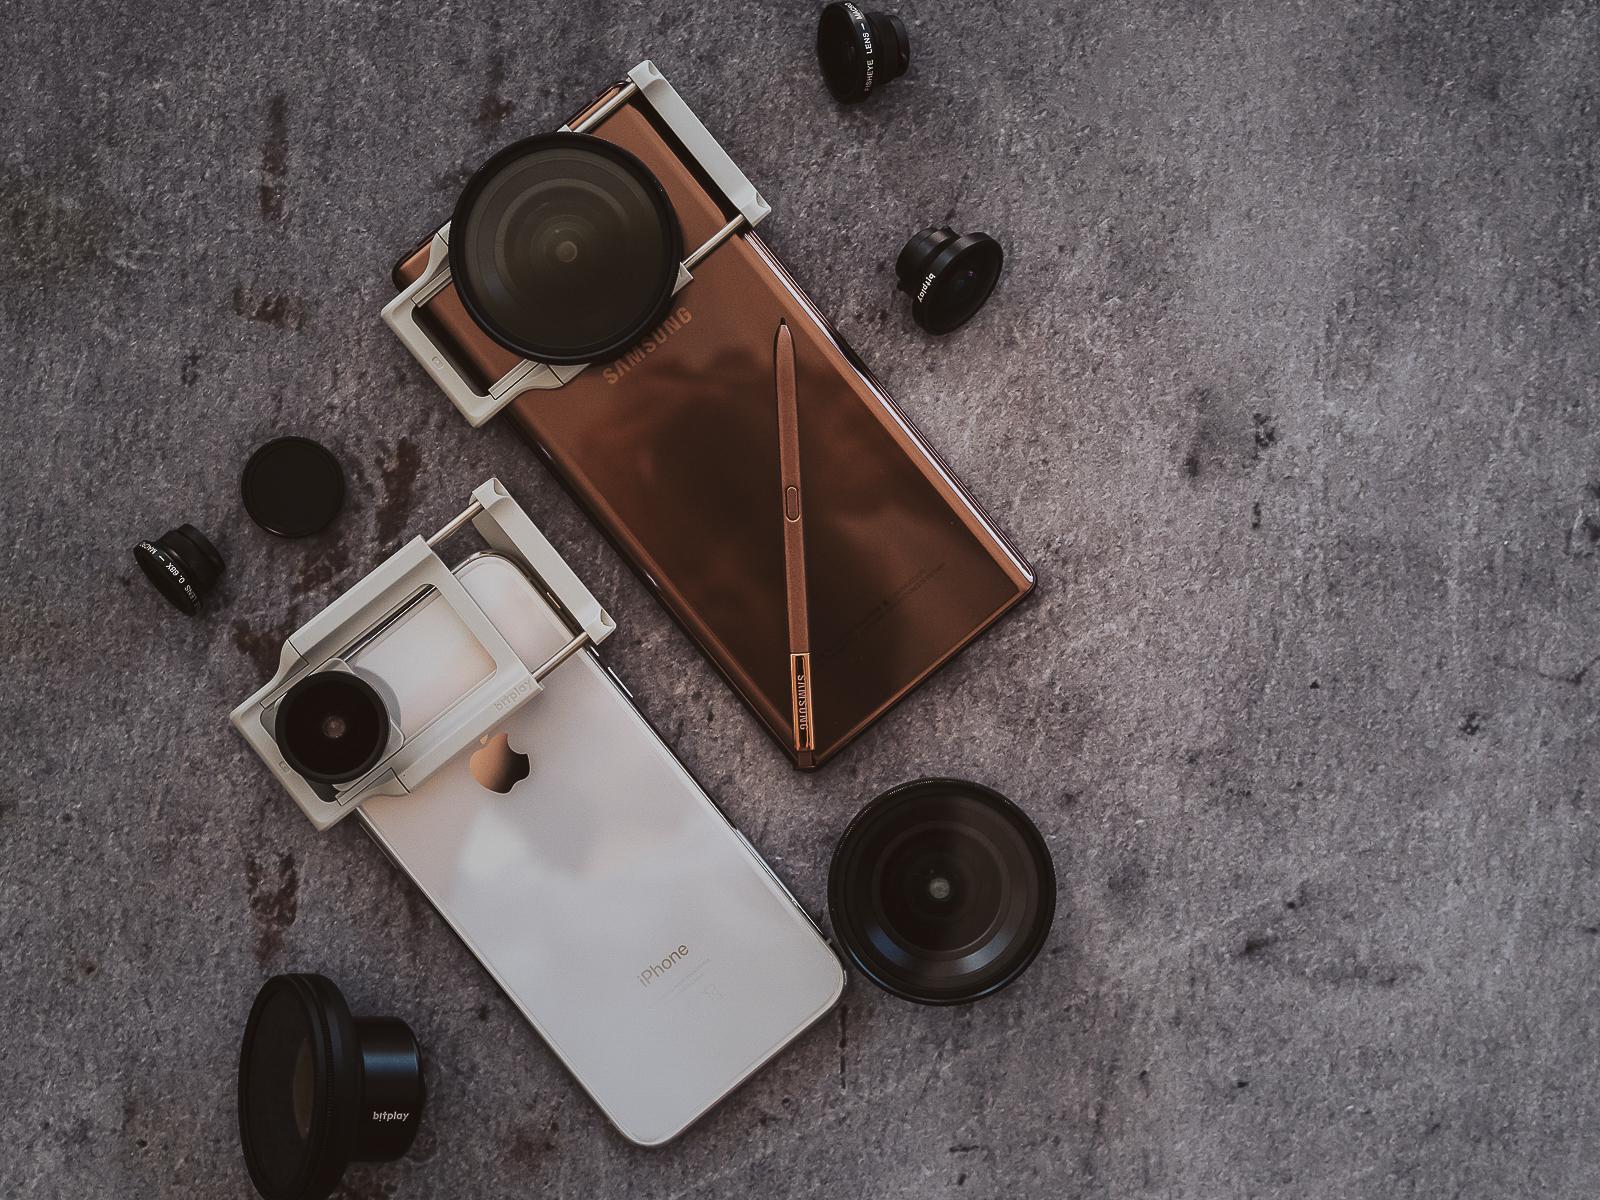 bitplay AllClip & iPhoneX + Samsung Galaxy Note9 - Olympus EM1Markii4518 - Yes! Please Enjoy-26.jpg